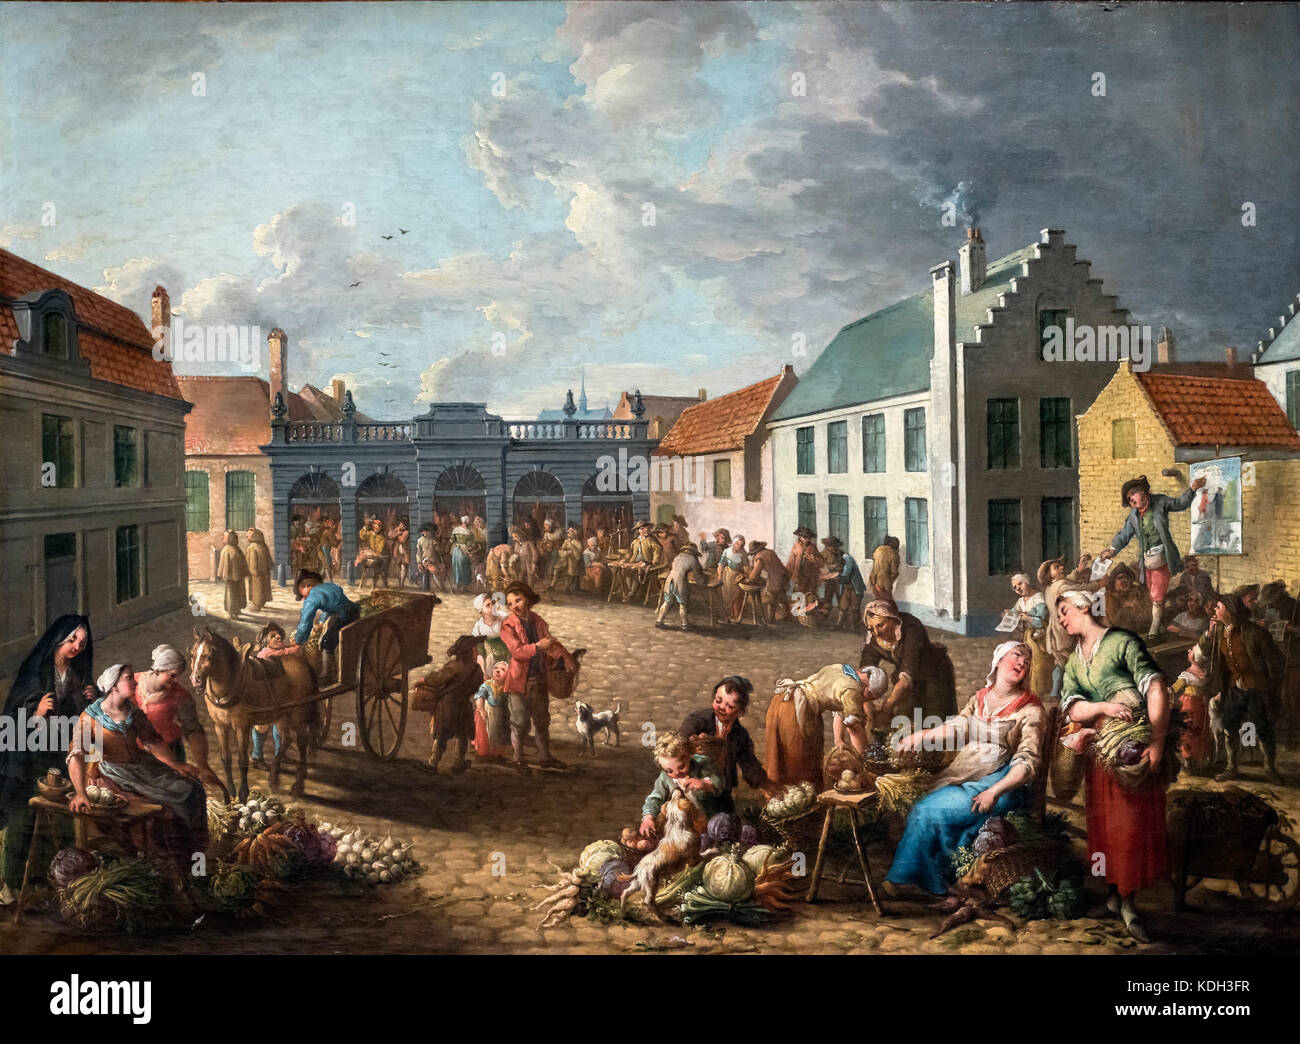 The Pandreitje in Bruges by Jan Anton Garemyn (Jan Anton Garemijn: 1712-1799), oil on canvas, 1778 - Stock Image